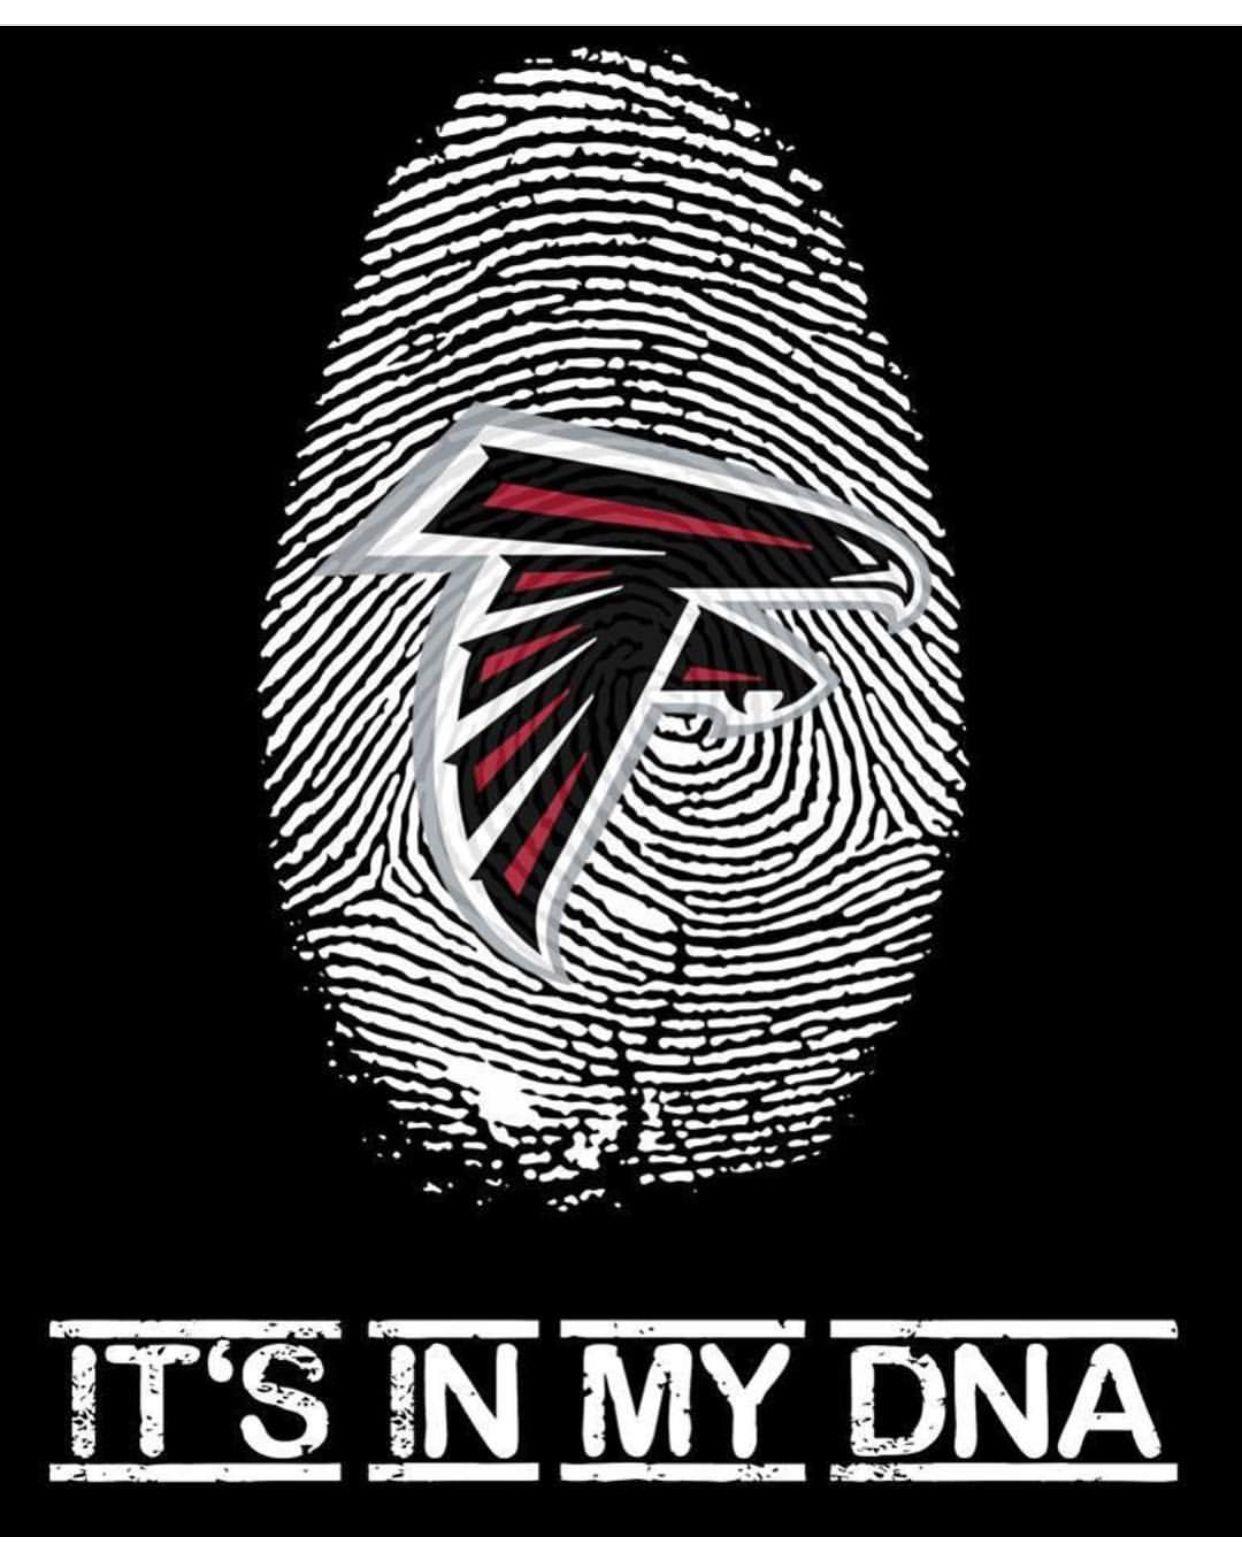 Pin By Latoya On The Brotherhood Atlanta Falcons Football Atlanta Falcons Fans Atlanta Falcons Wallpaper